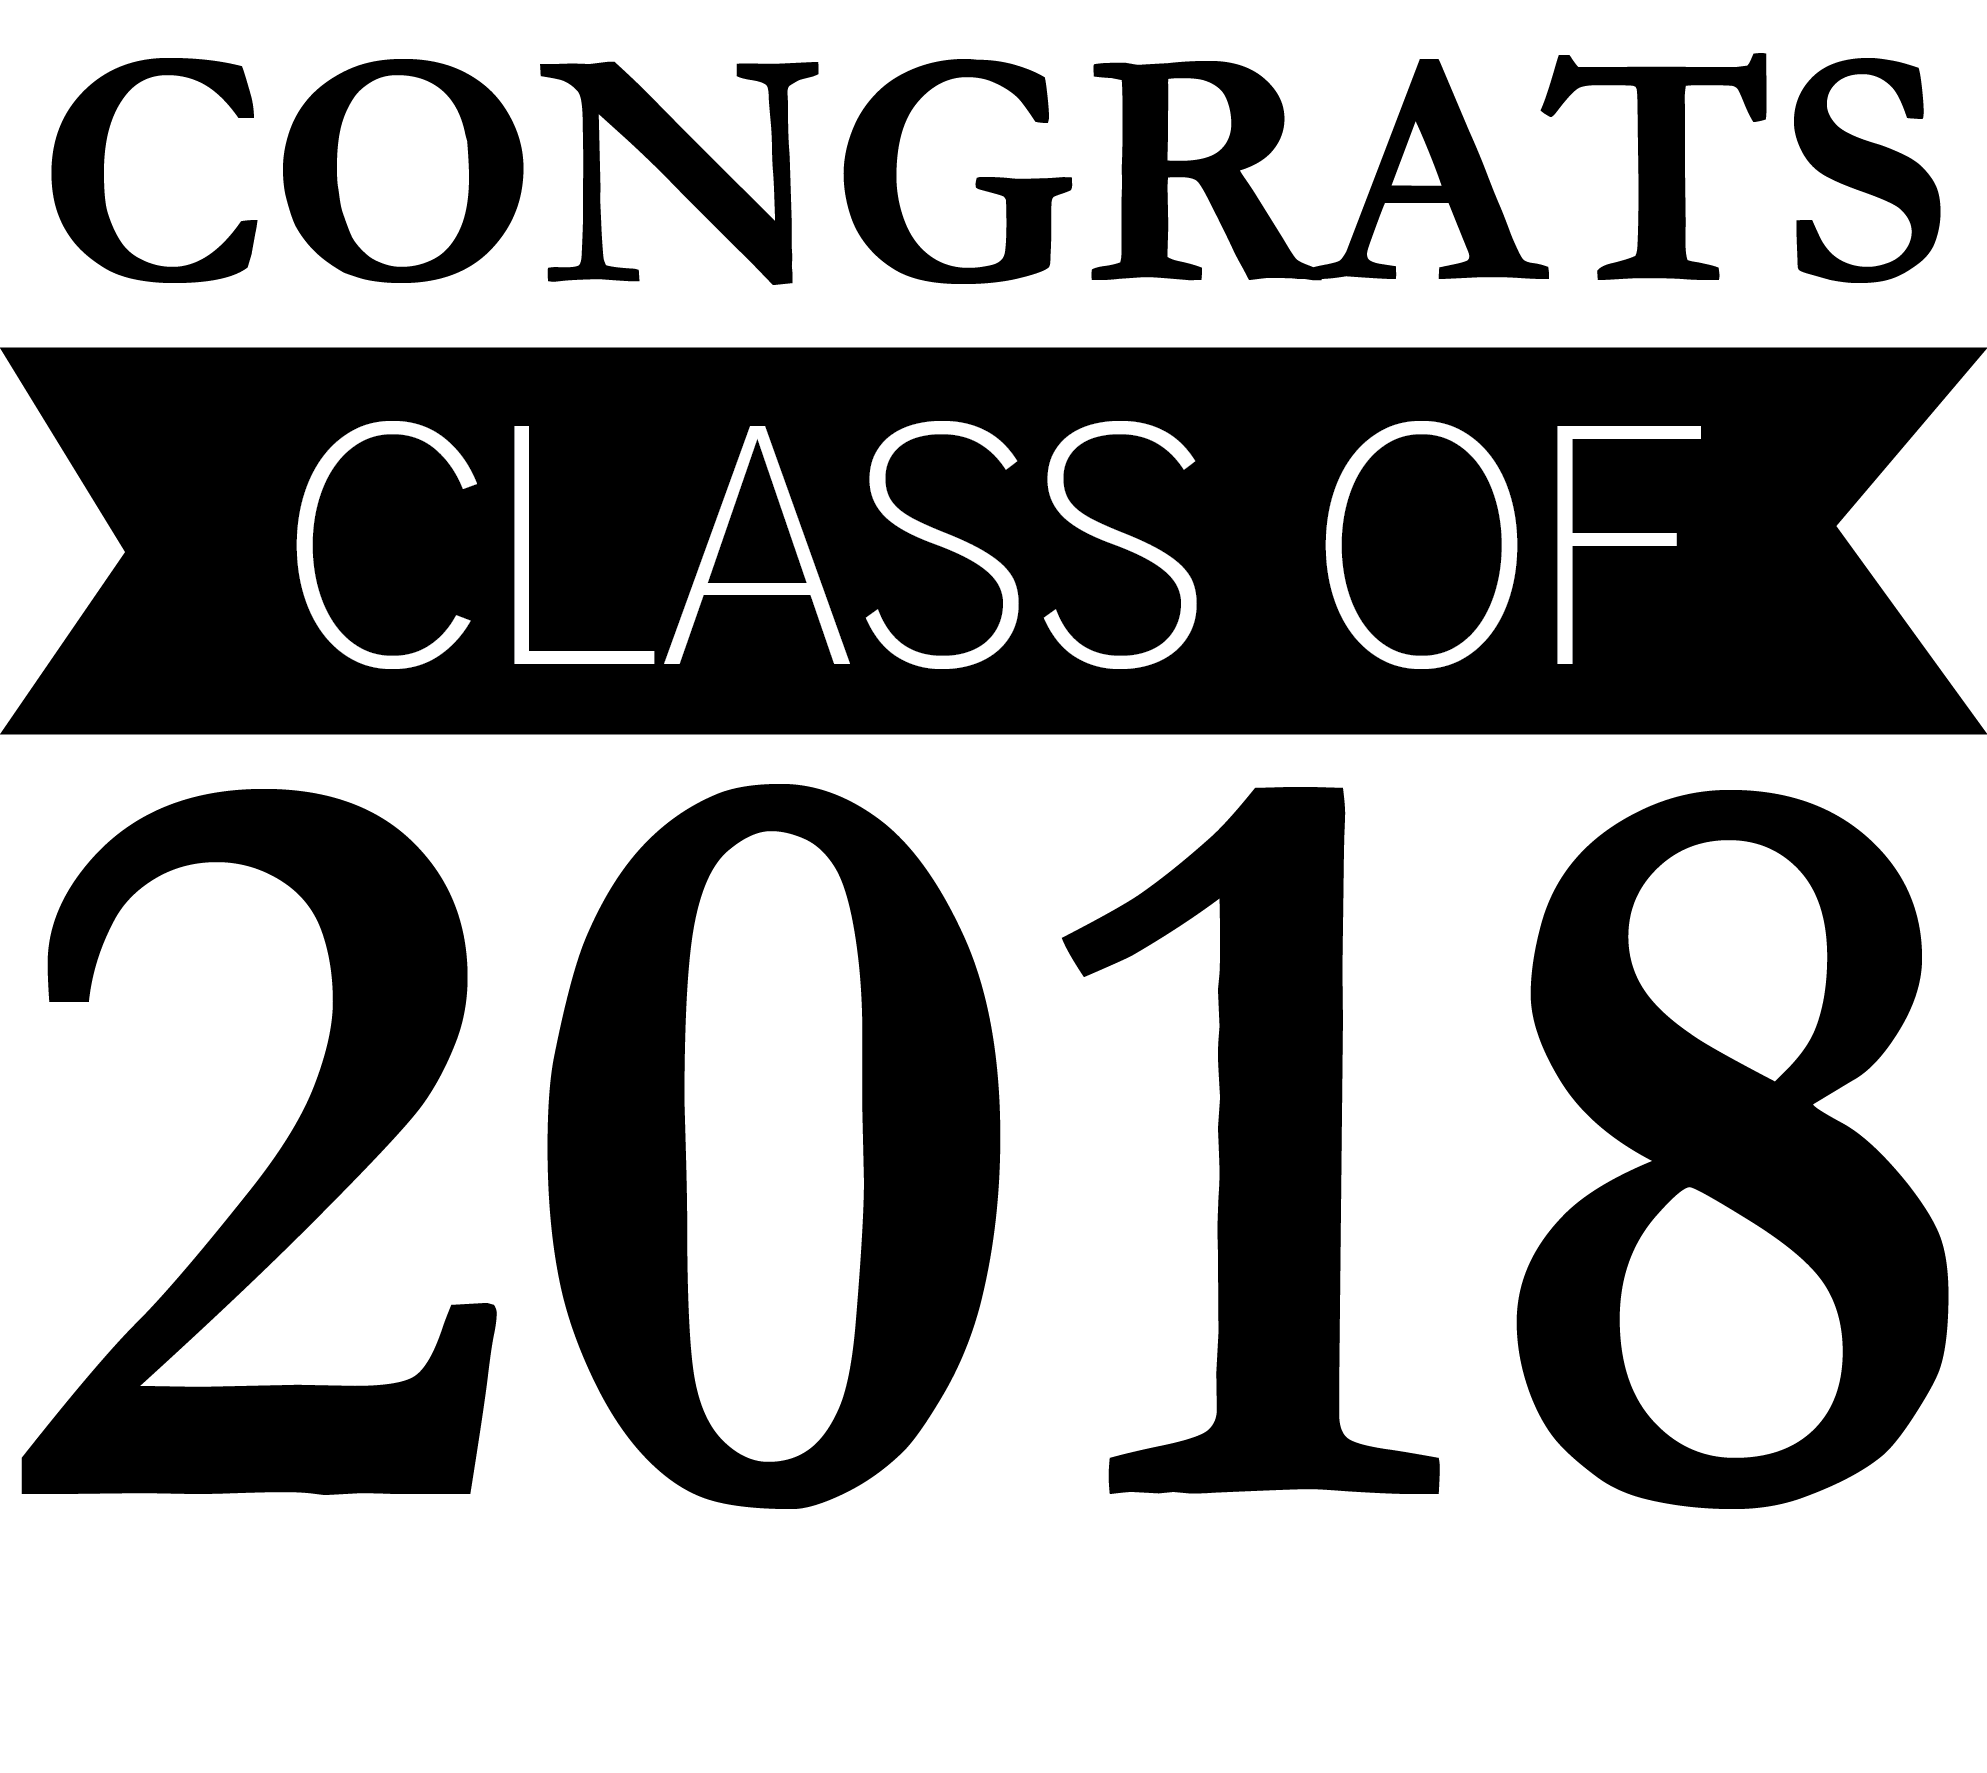 Future clipart congratulation graduate 2018. Congrats class of graduation